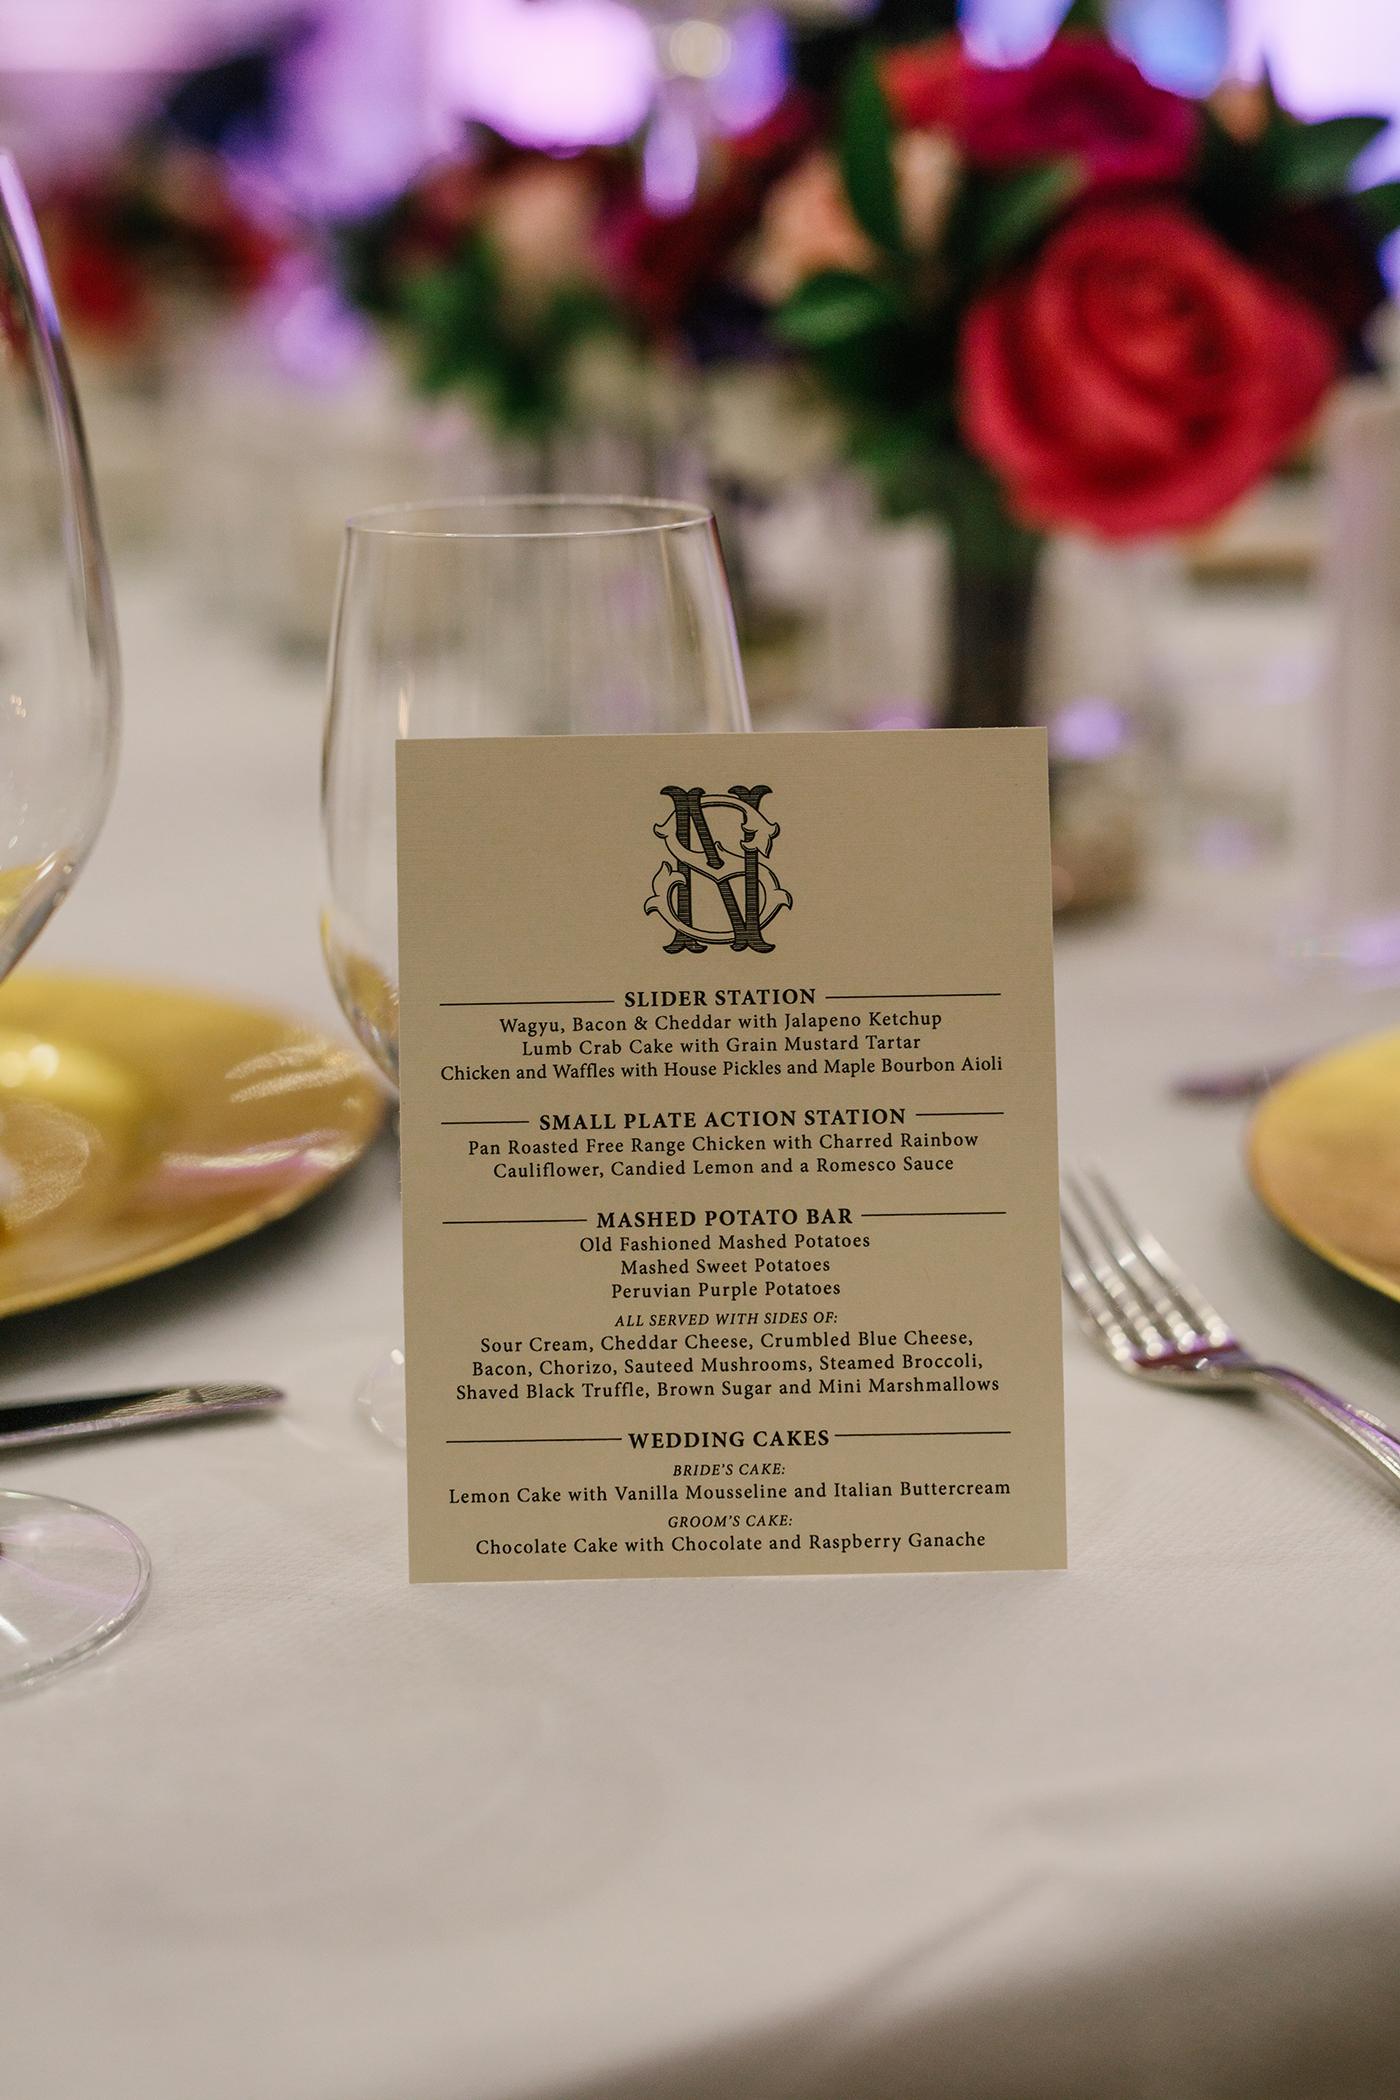 Dallas Weddings Planner - Allday Events - Katie + Matthew at The Adolphus Hotel - 508.jpg